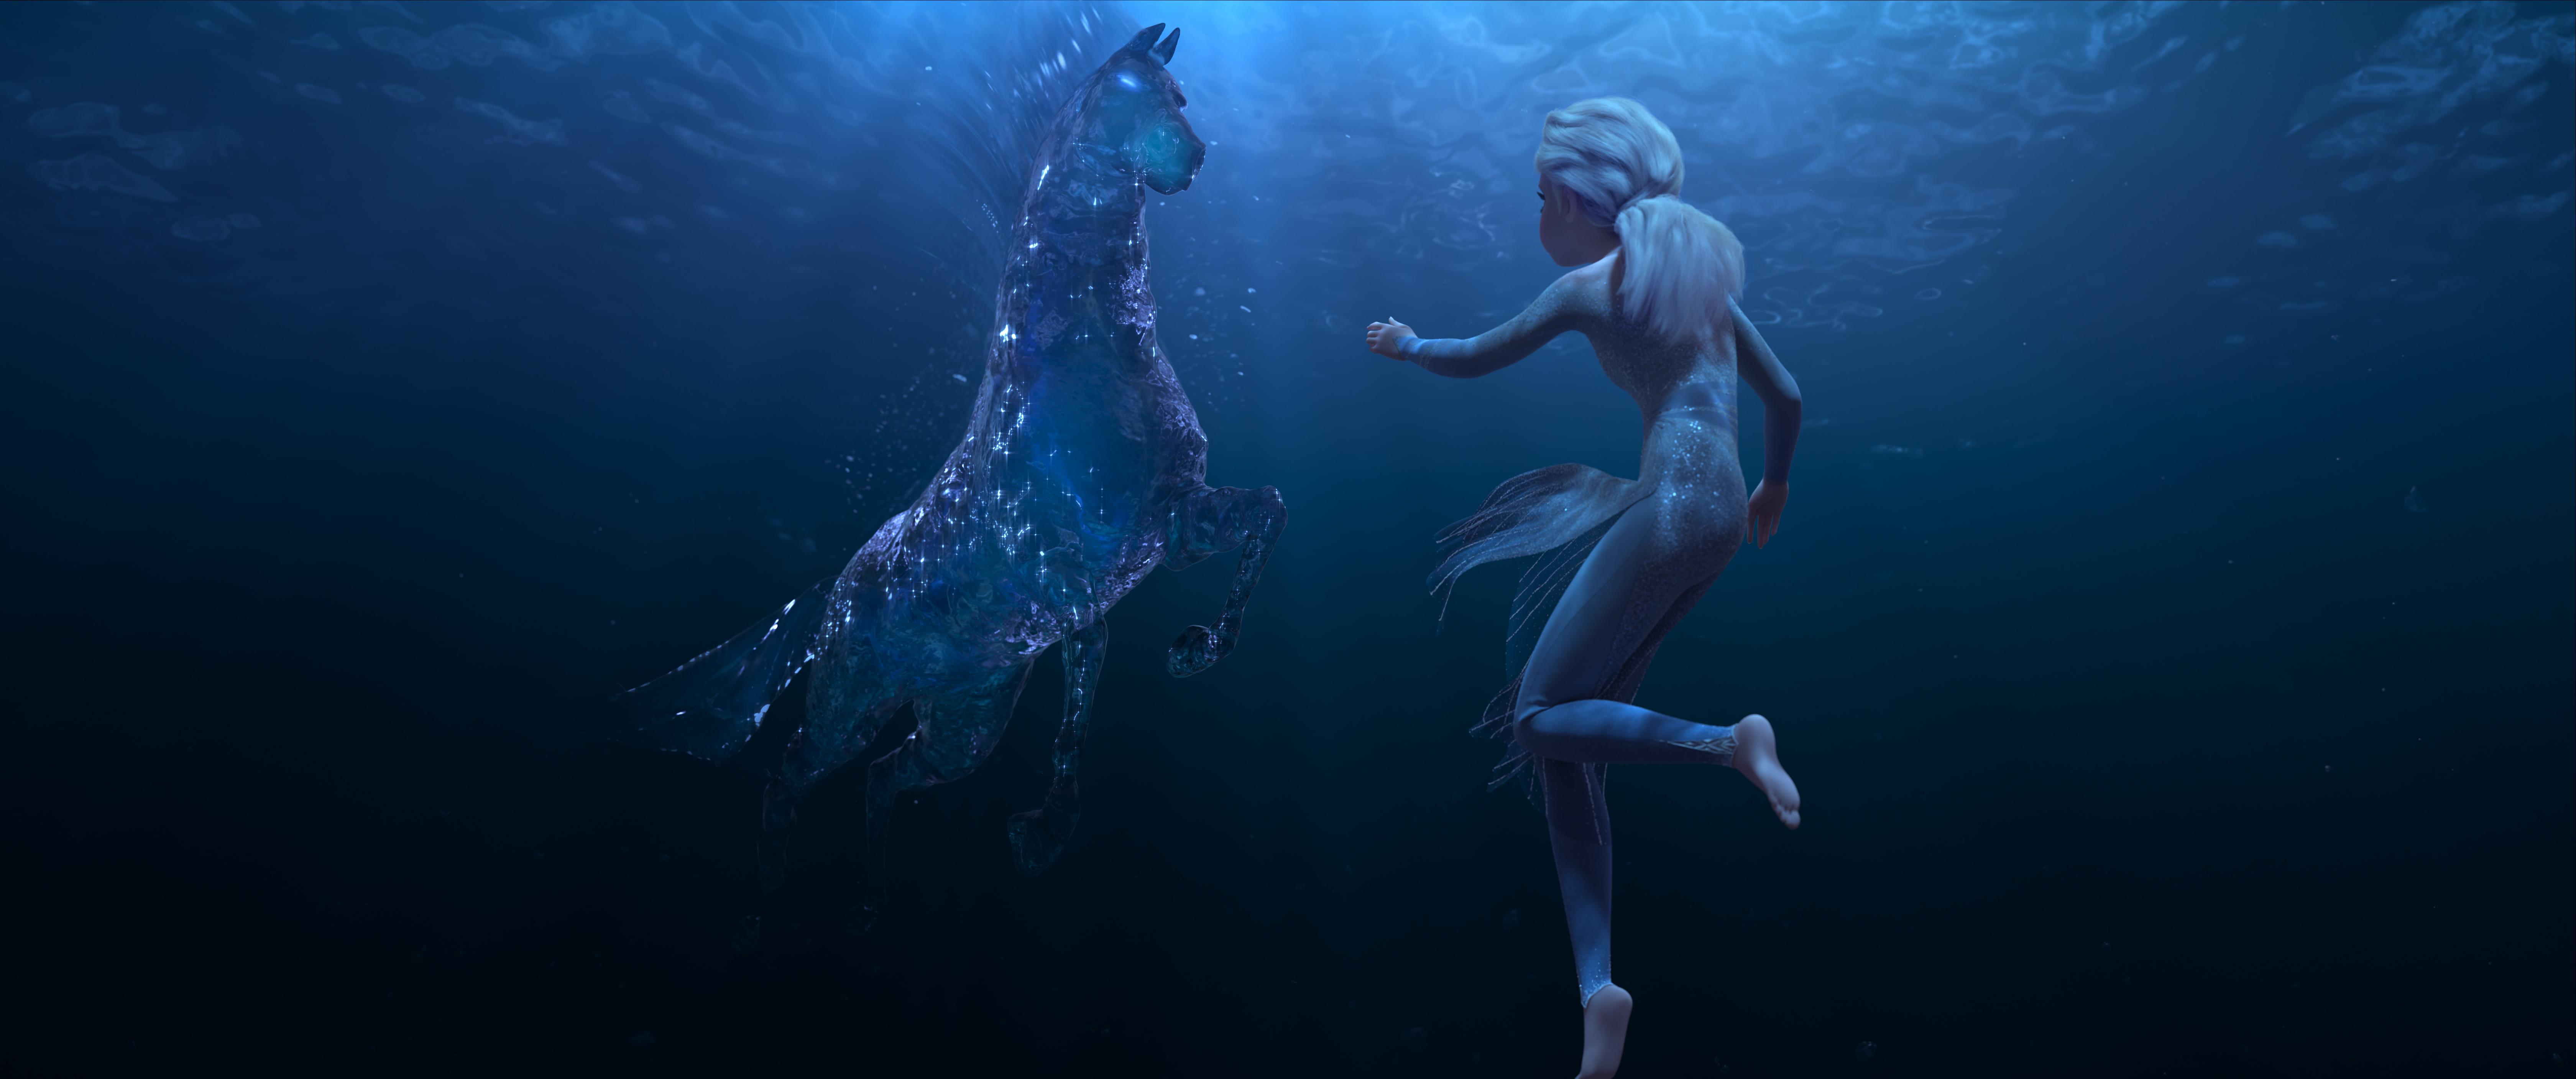 Elsa and Nokk, a mythical water spirit in Frozen 2